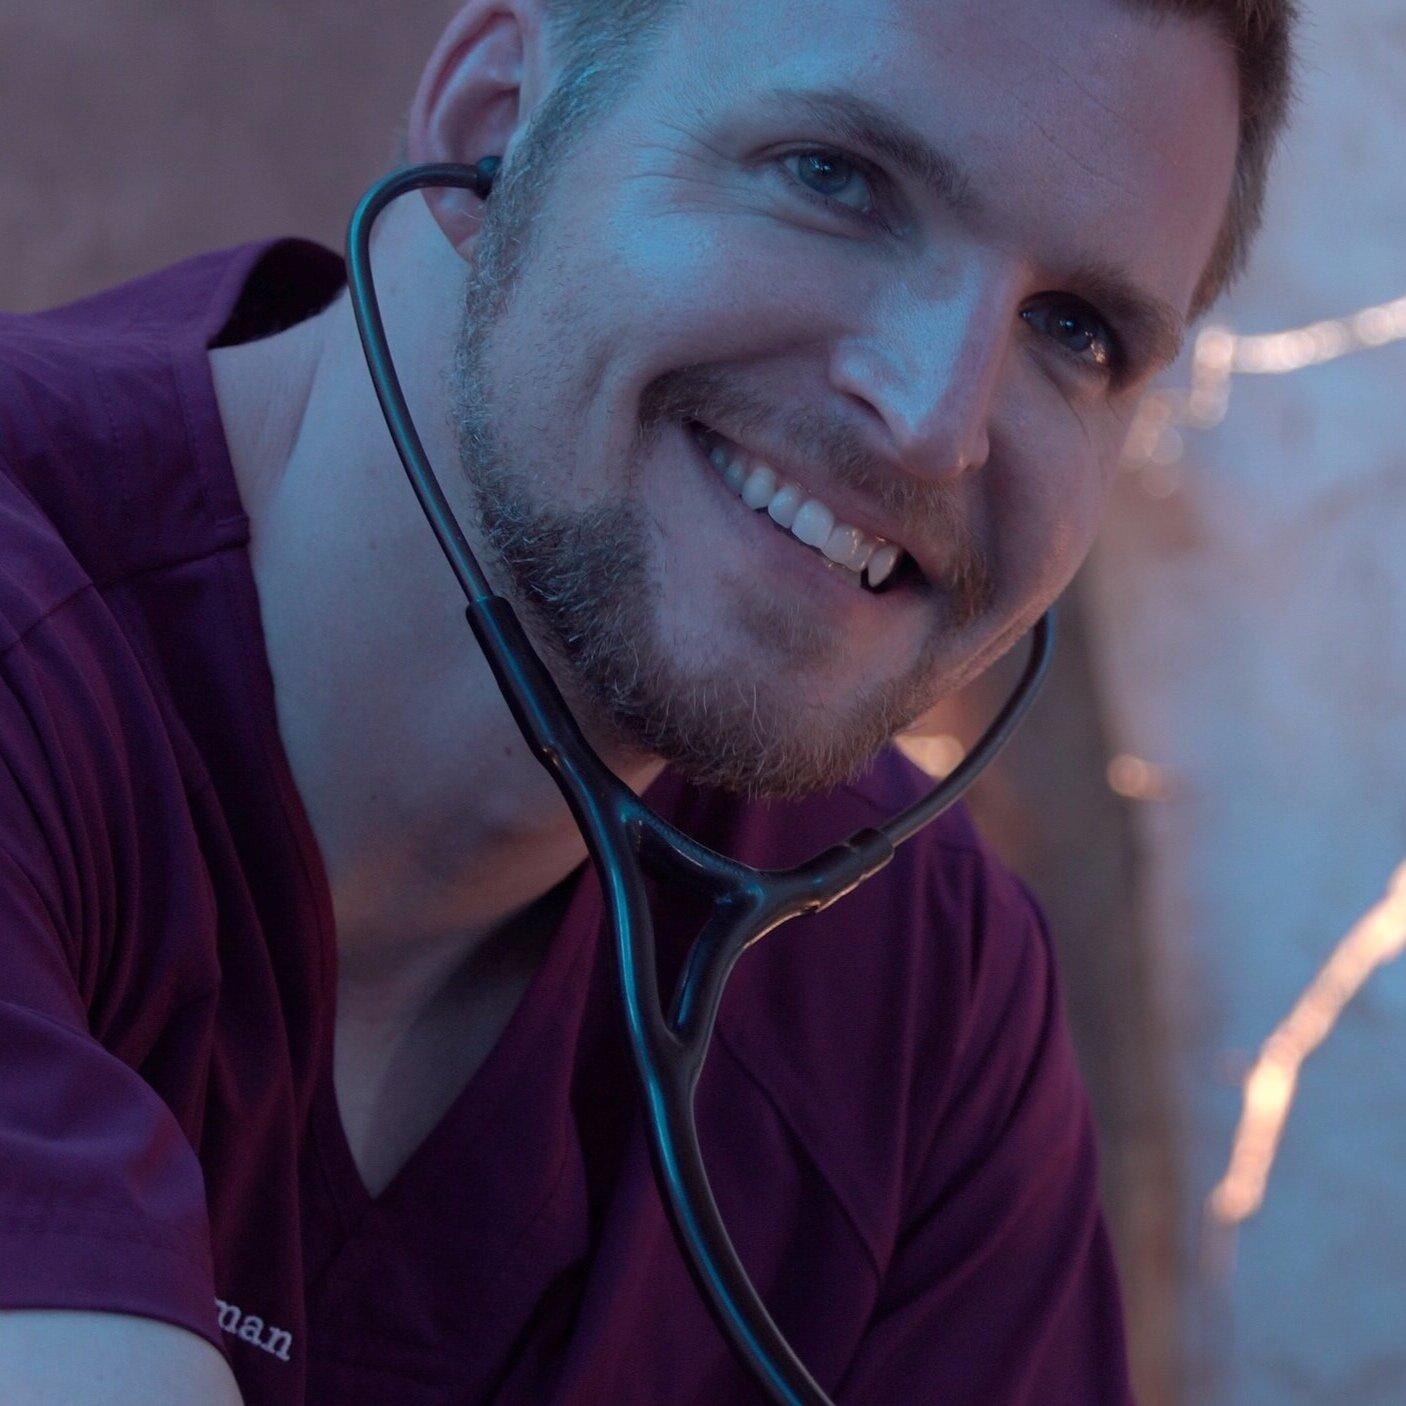 m%C3%A9decin+sourire.jpg